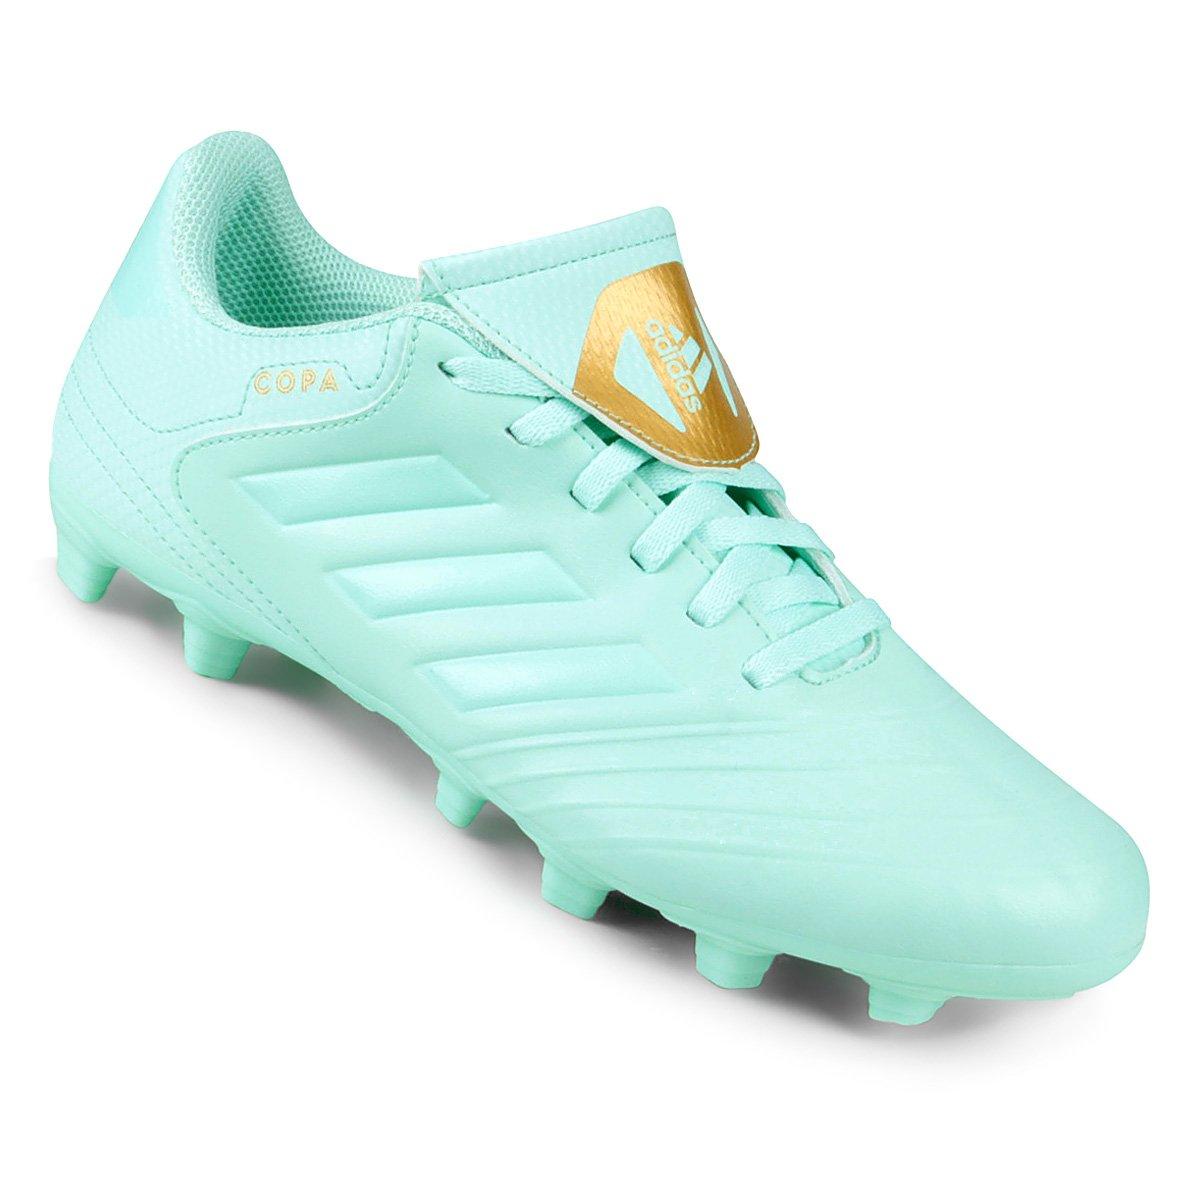 7a8b9c3a41 Chuteira Campo Adidas Copa 18 4 FG